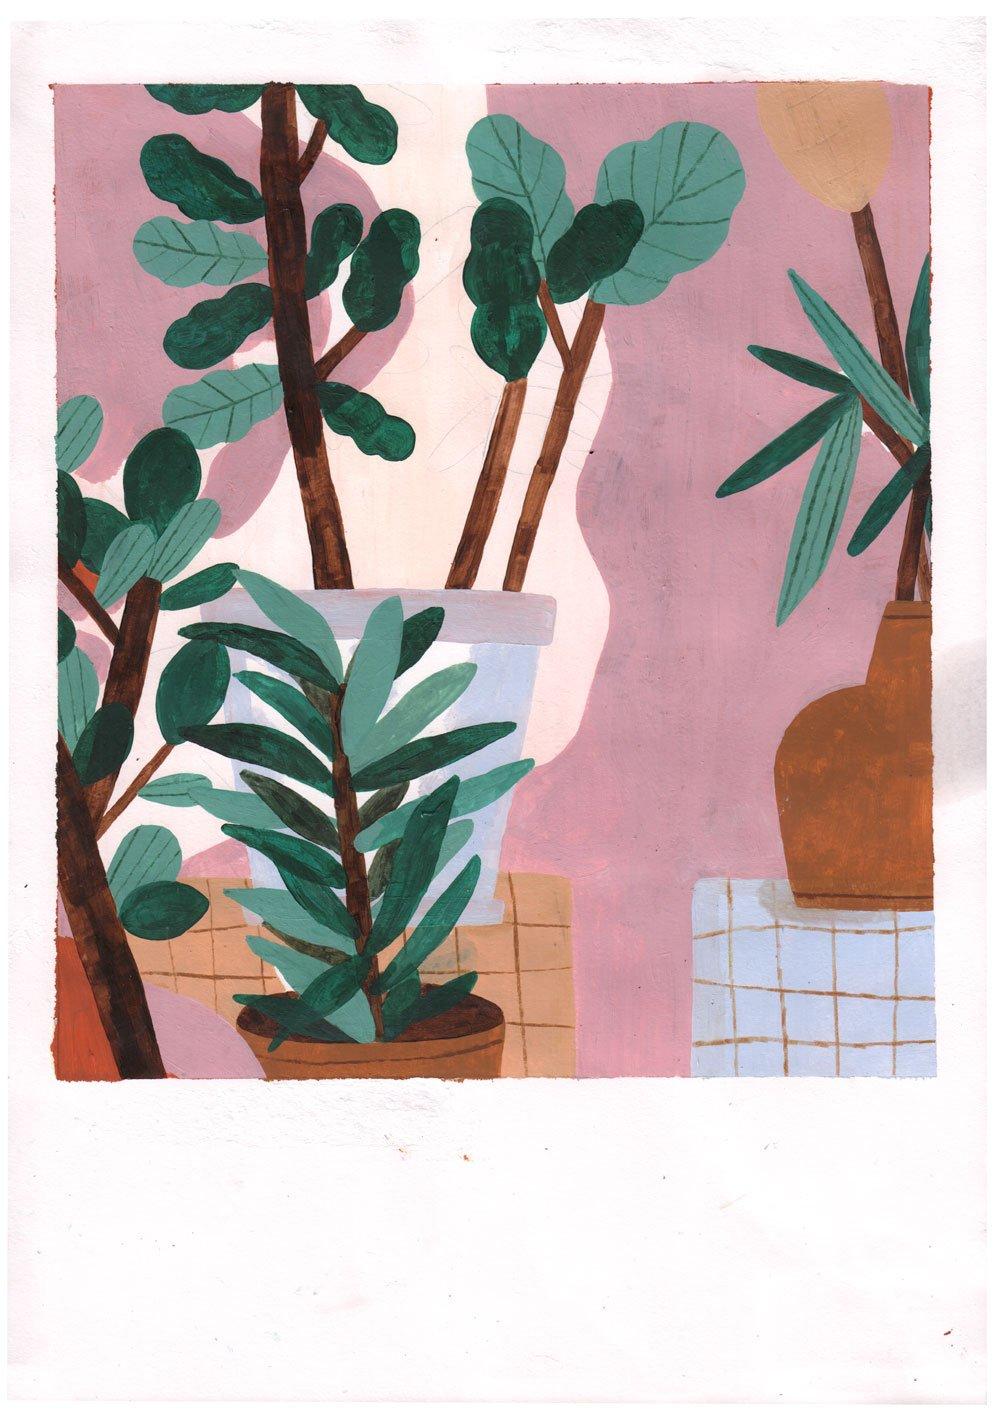 Image of Plants (Original)